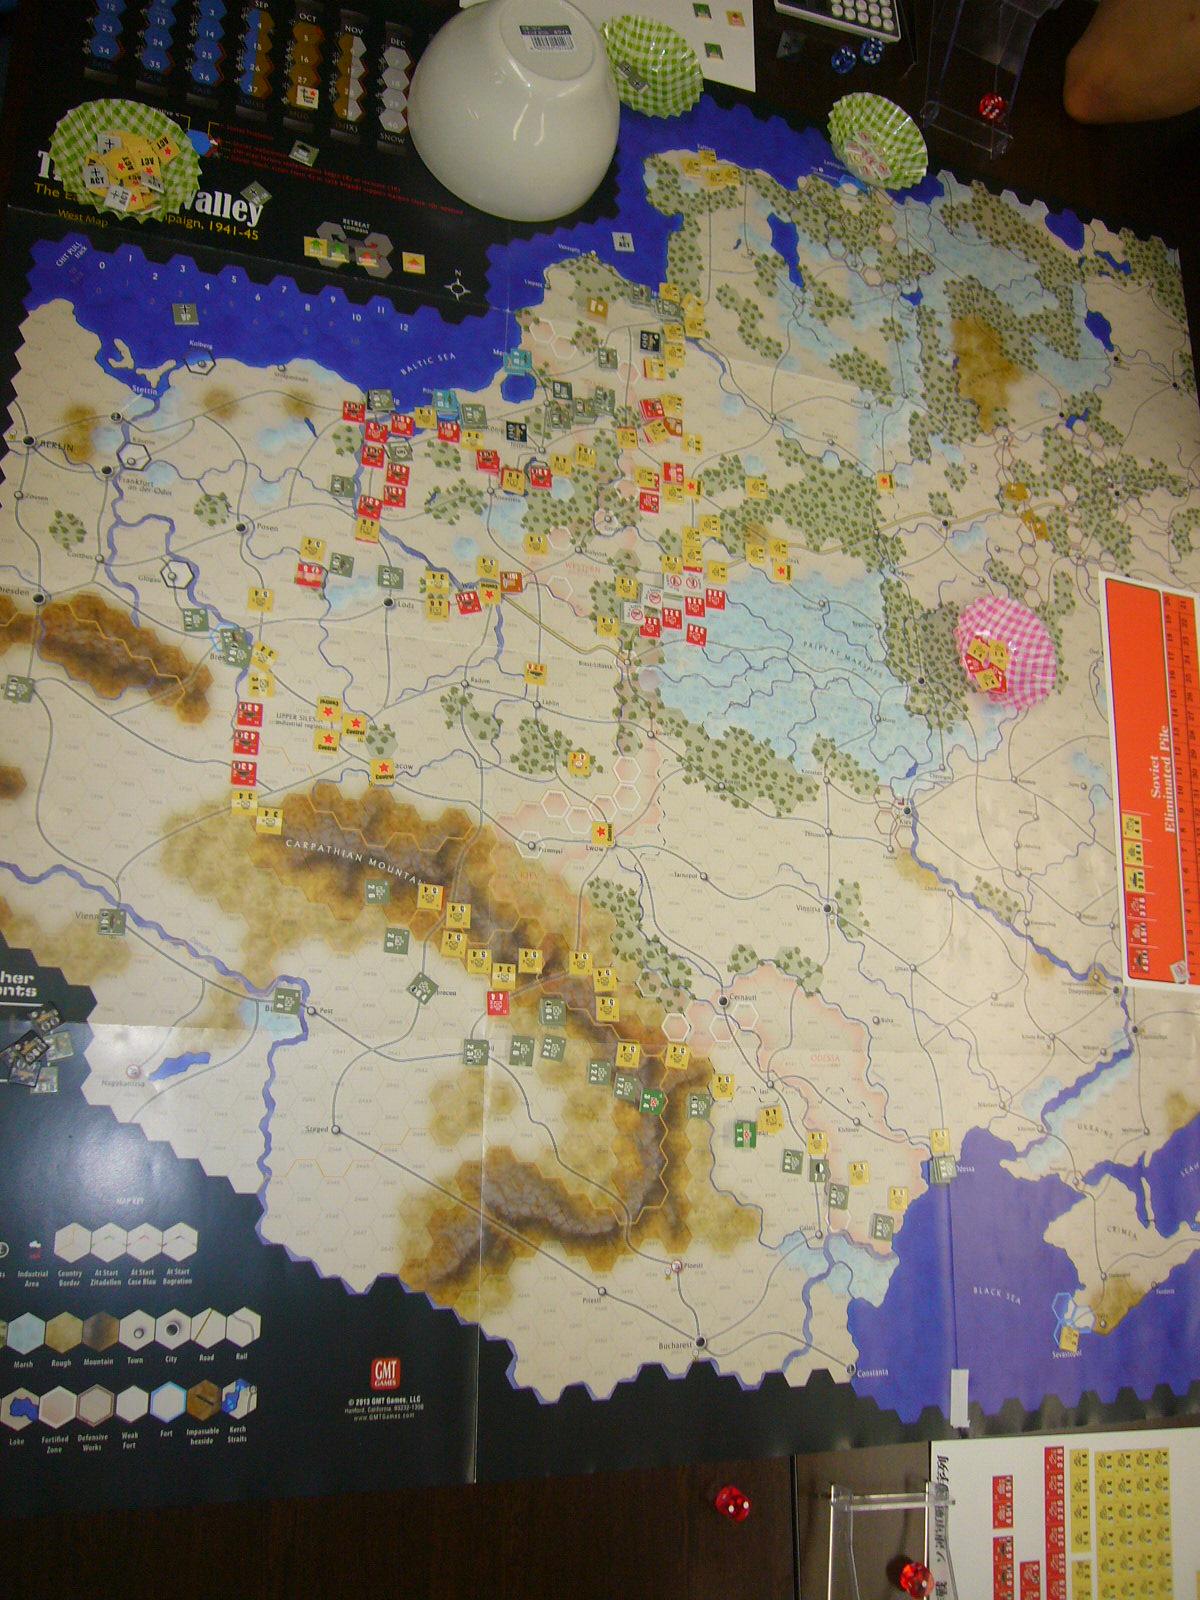 6/21 YSGA第300回定例会の様子その3(GMT)ダーク・バレー「1944バグラチオン作戦」シナリオ3人戦)_b0173672_23041317.jpg